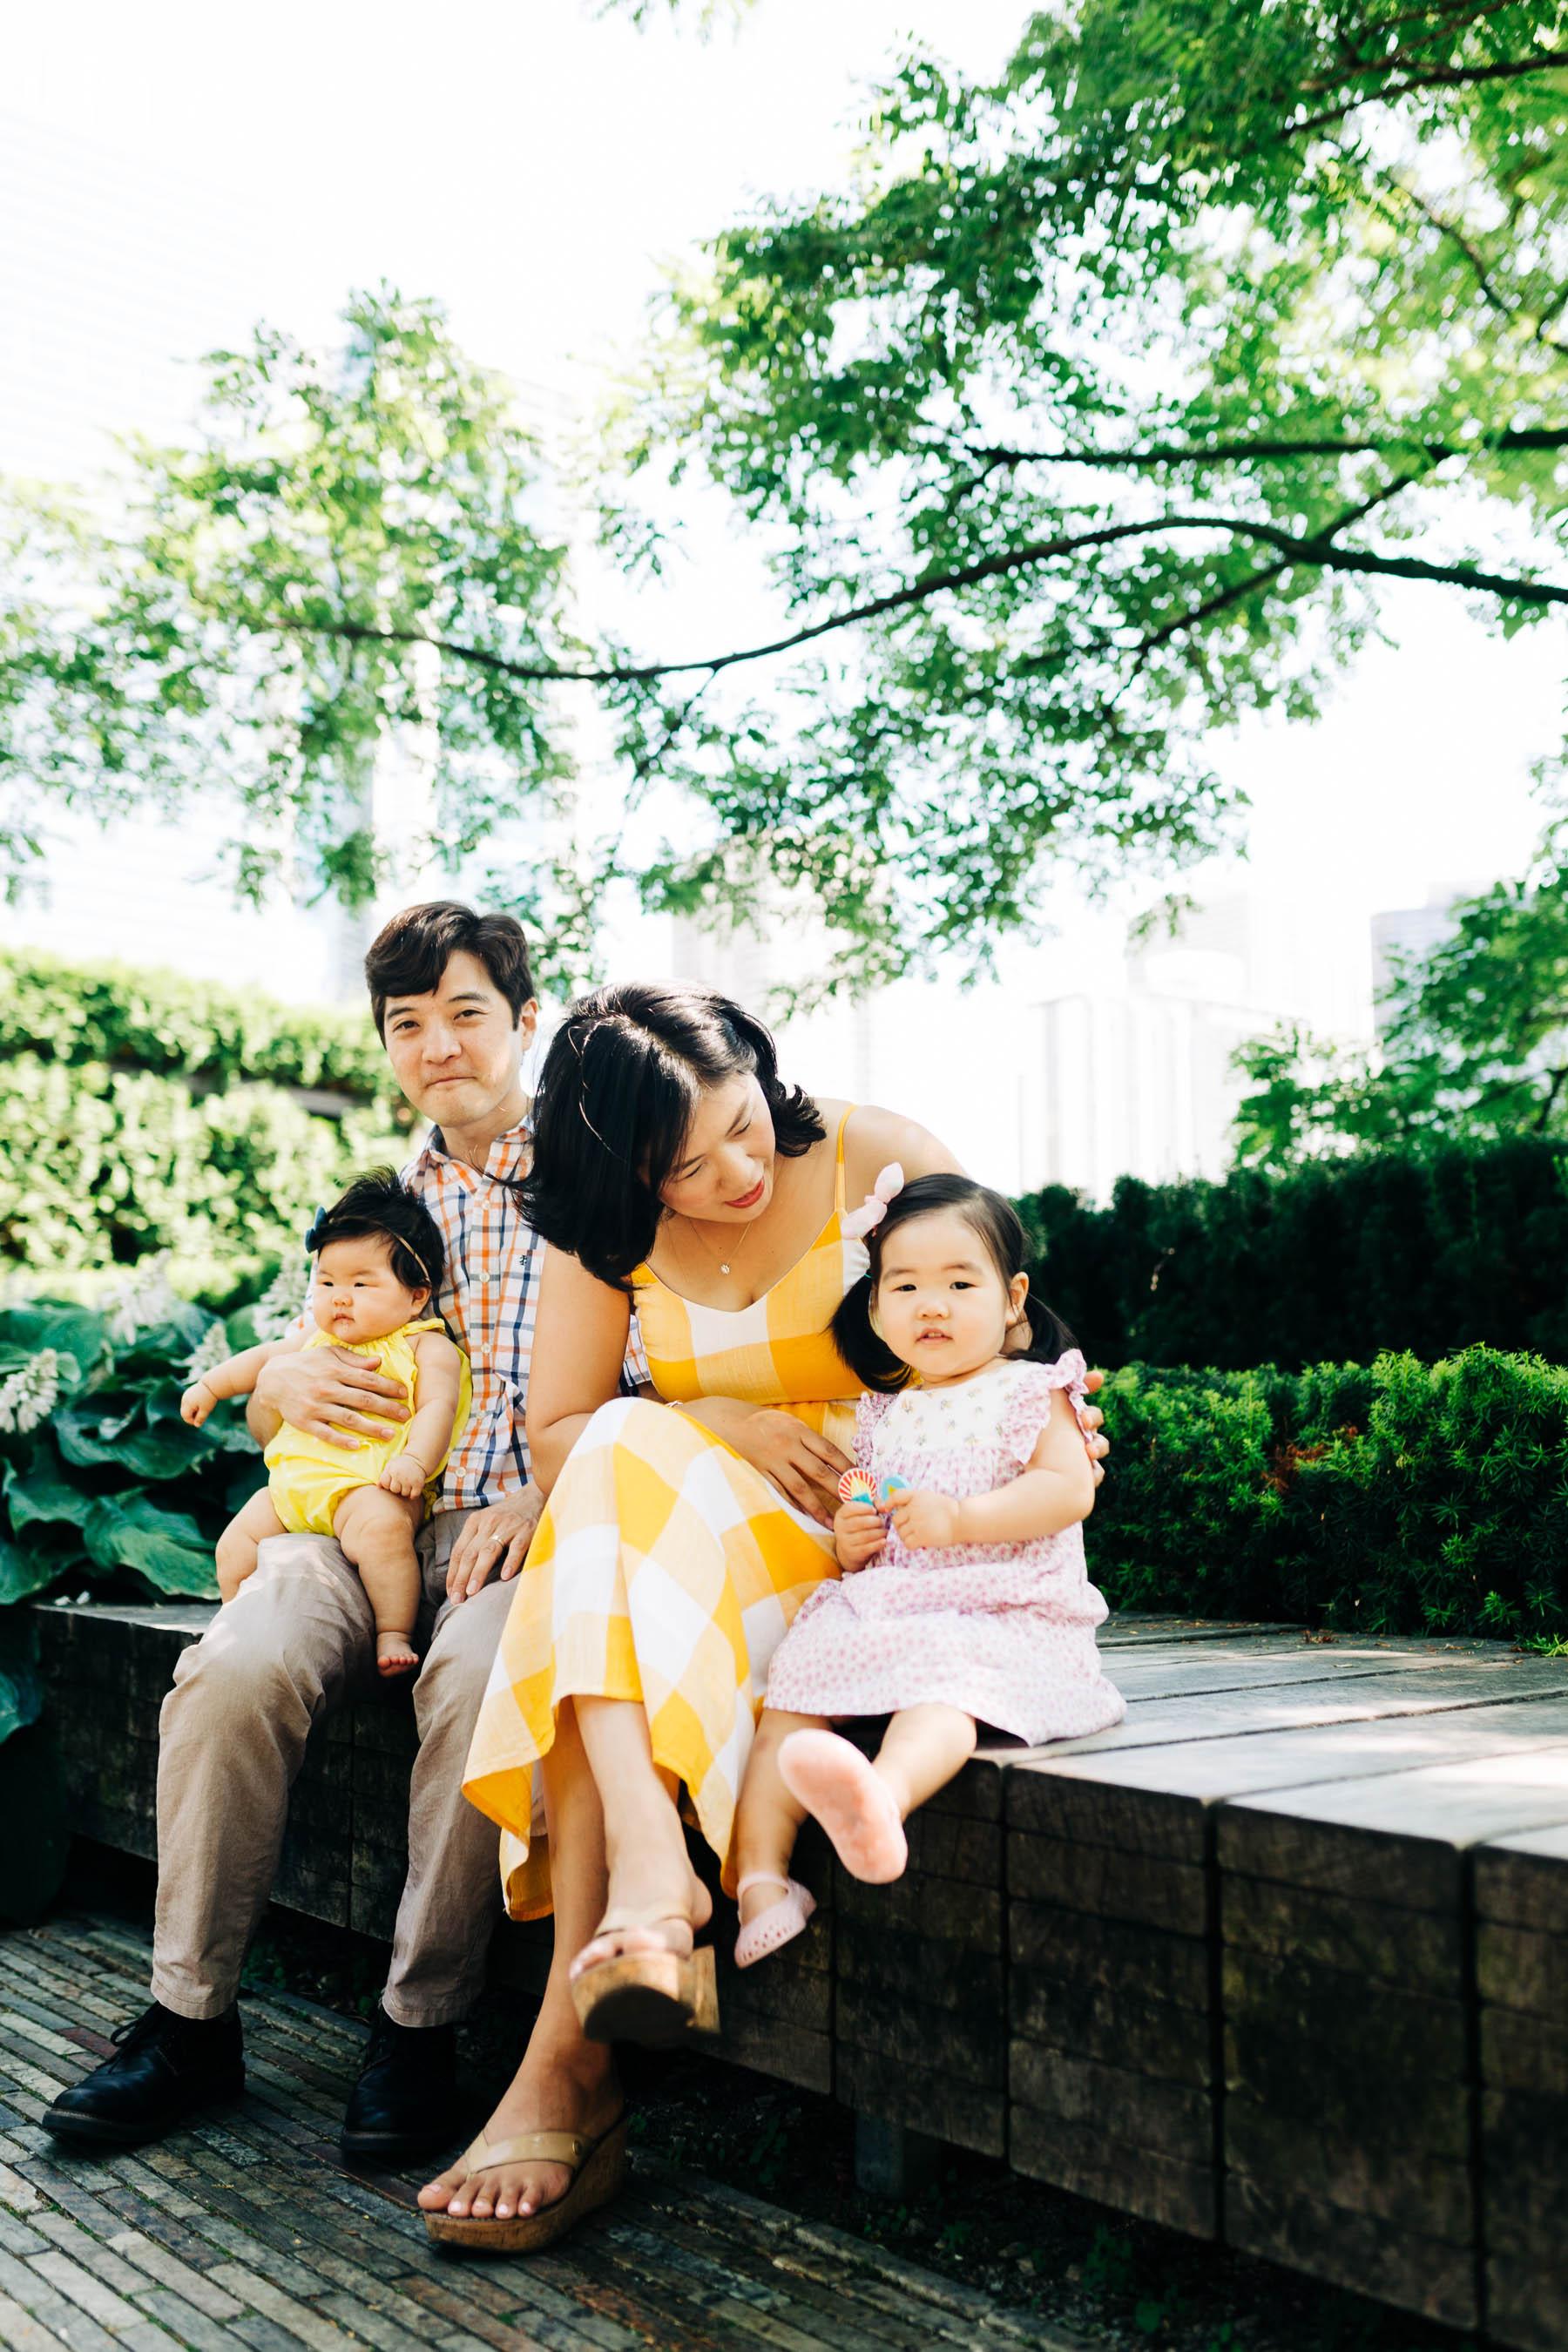 chicago-family-lifestyle-photographer-4.jpg